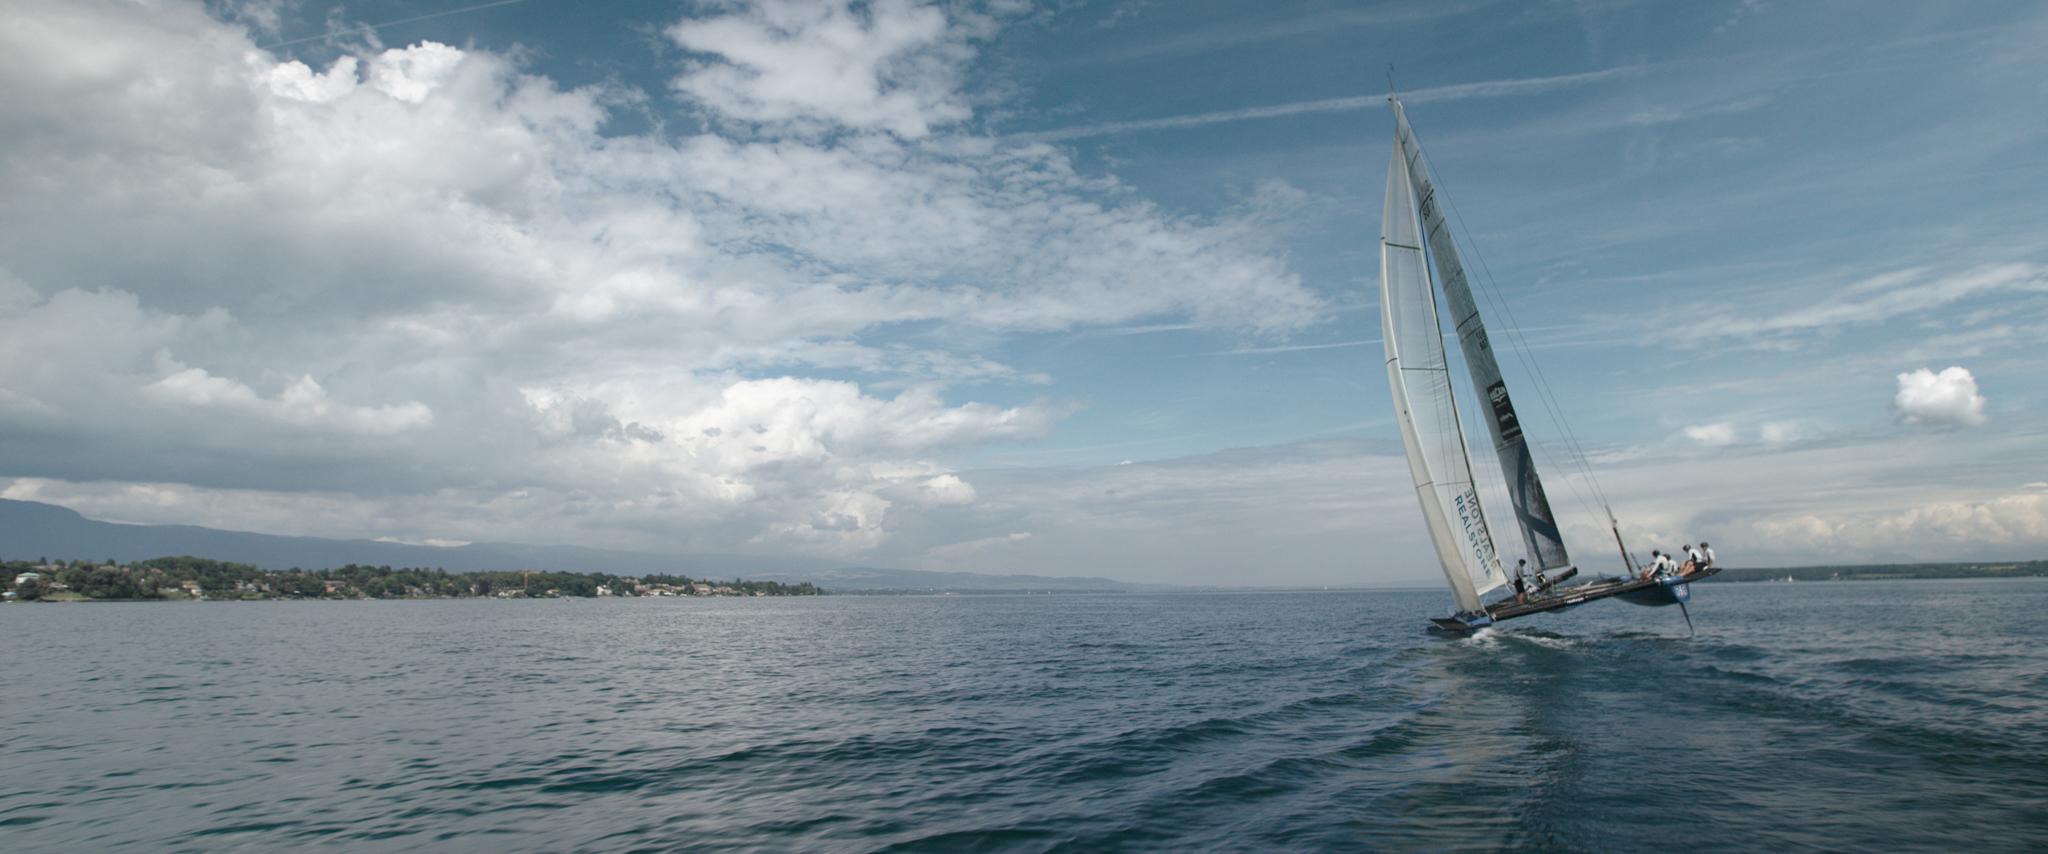 RUAG_Sailing_Web-4